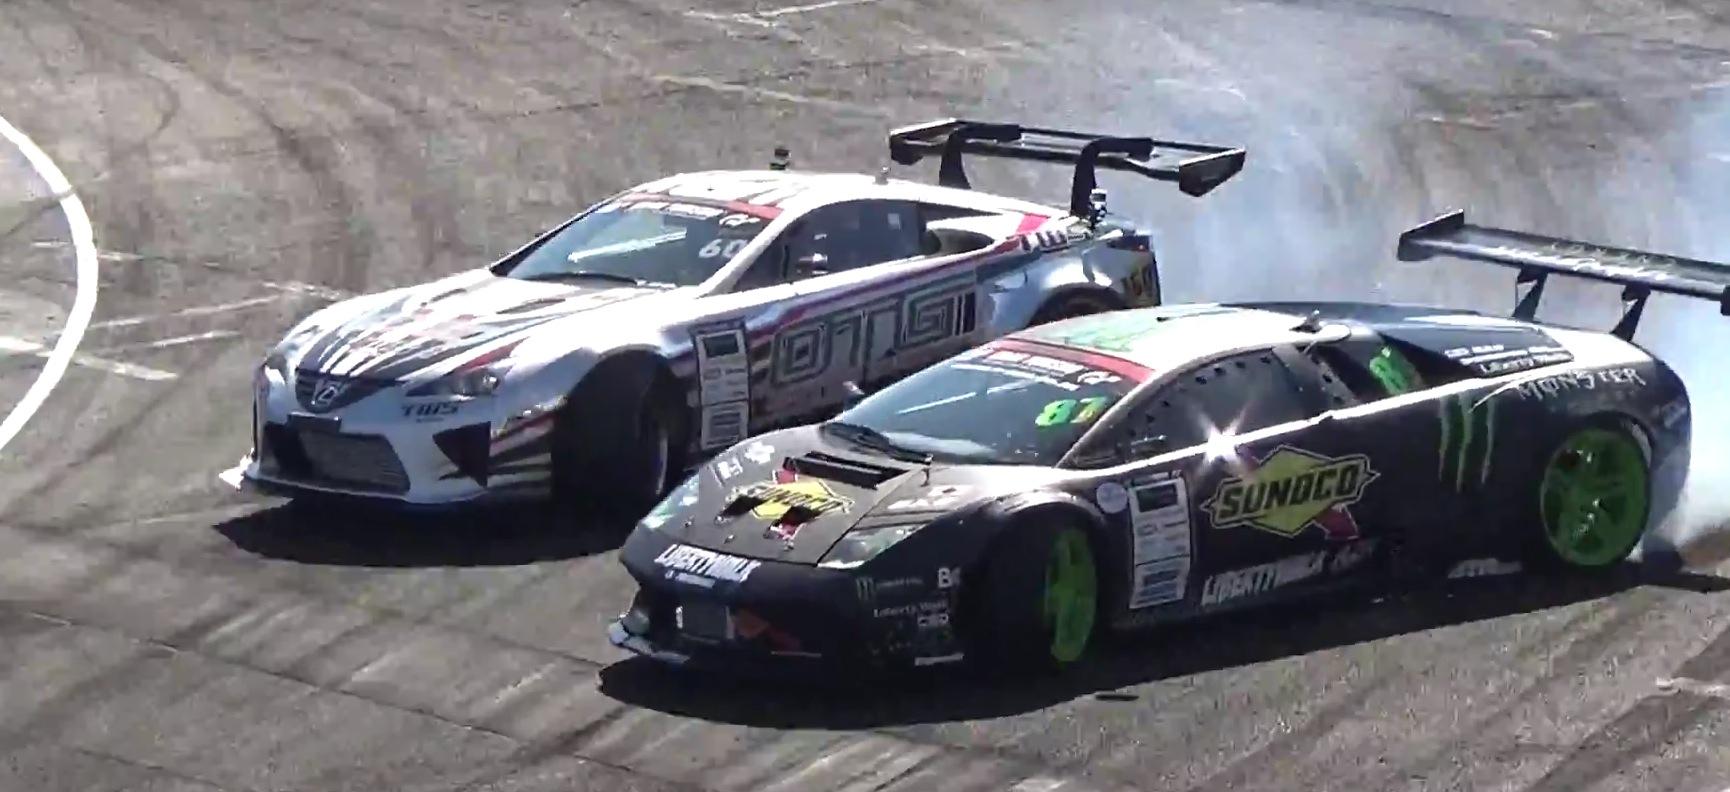 Ken Block Cars Wallpaper See The First Drifting Lamborghini Murcielago Compete